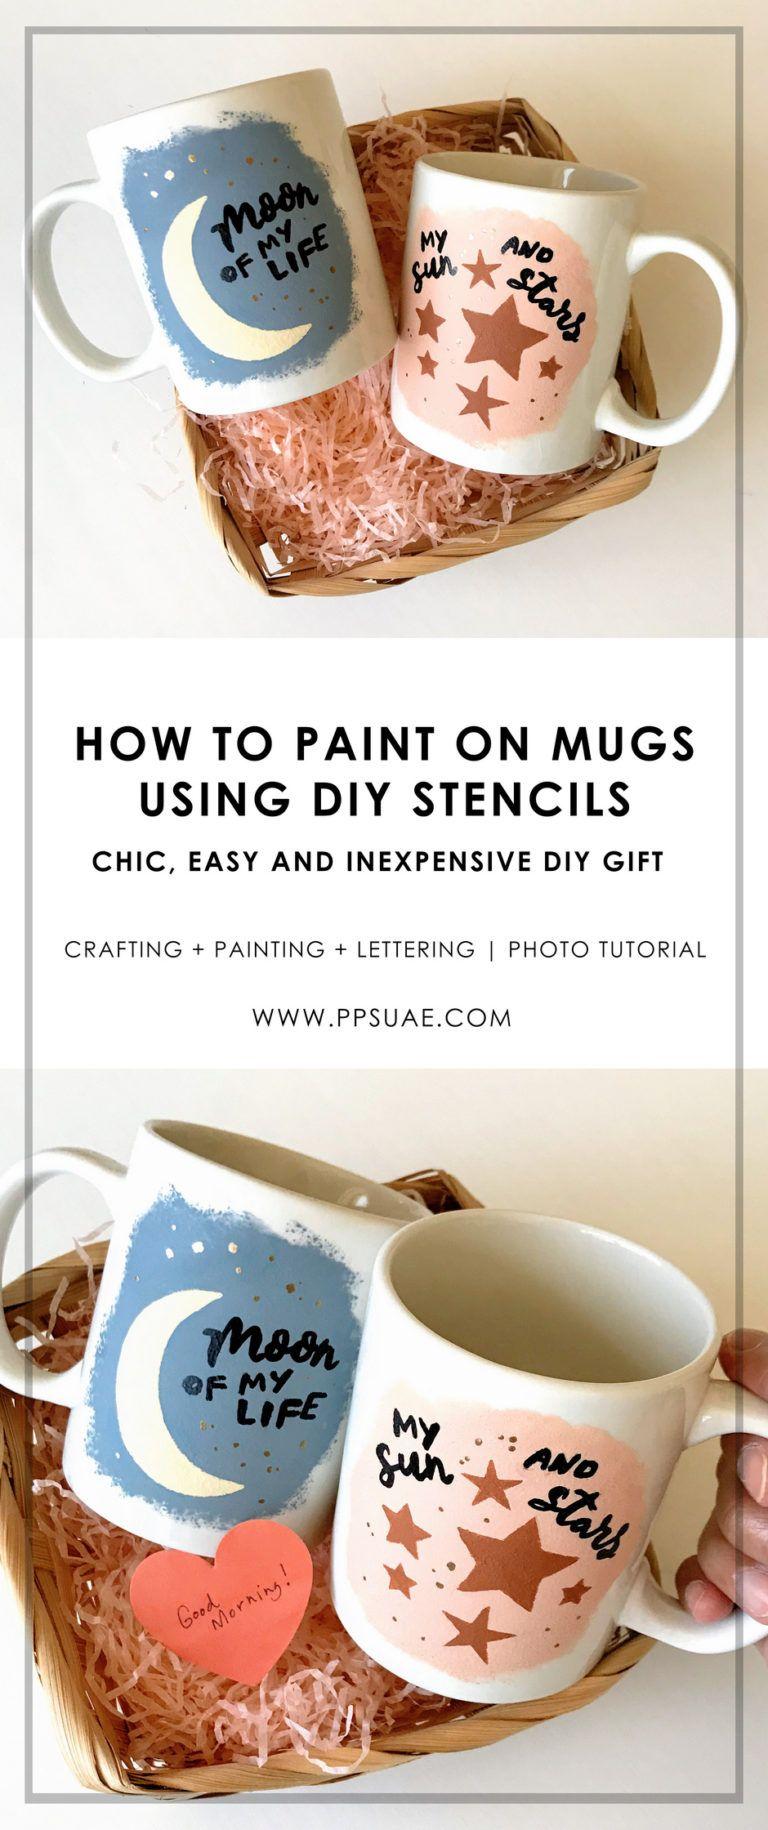 How To Paint On Mugs Using Diy Stencils Photo Tutorial Tutorials Diy Mug Designs Painted Mugs Acrylic Painting Diy